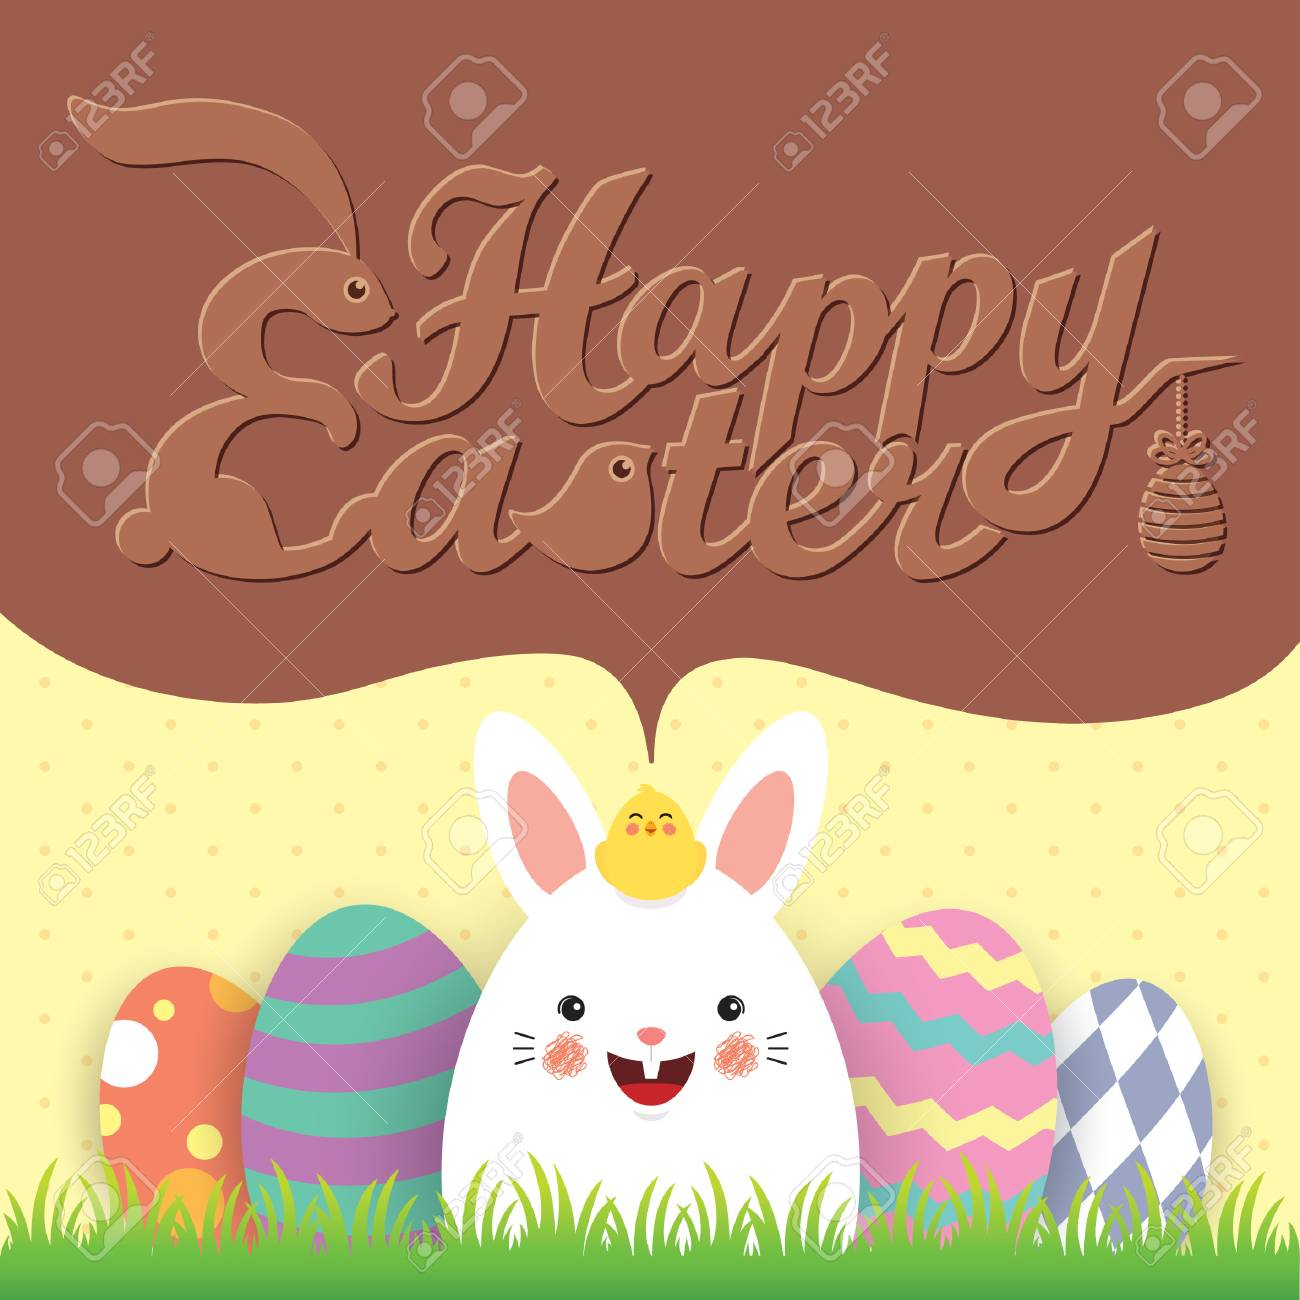 Easter Egg Hunt Invitation Template Design Cute Cartoon Rabbit Baby